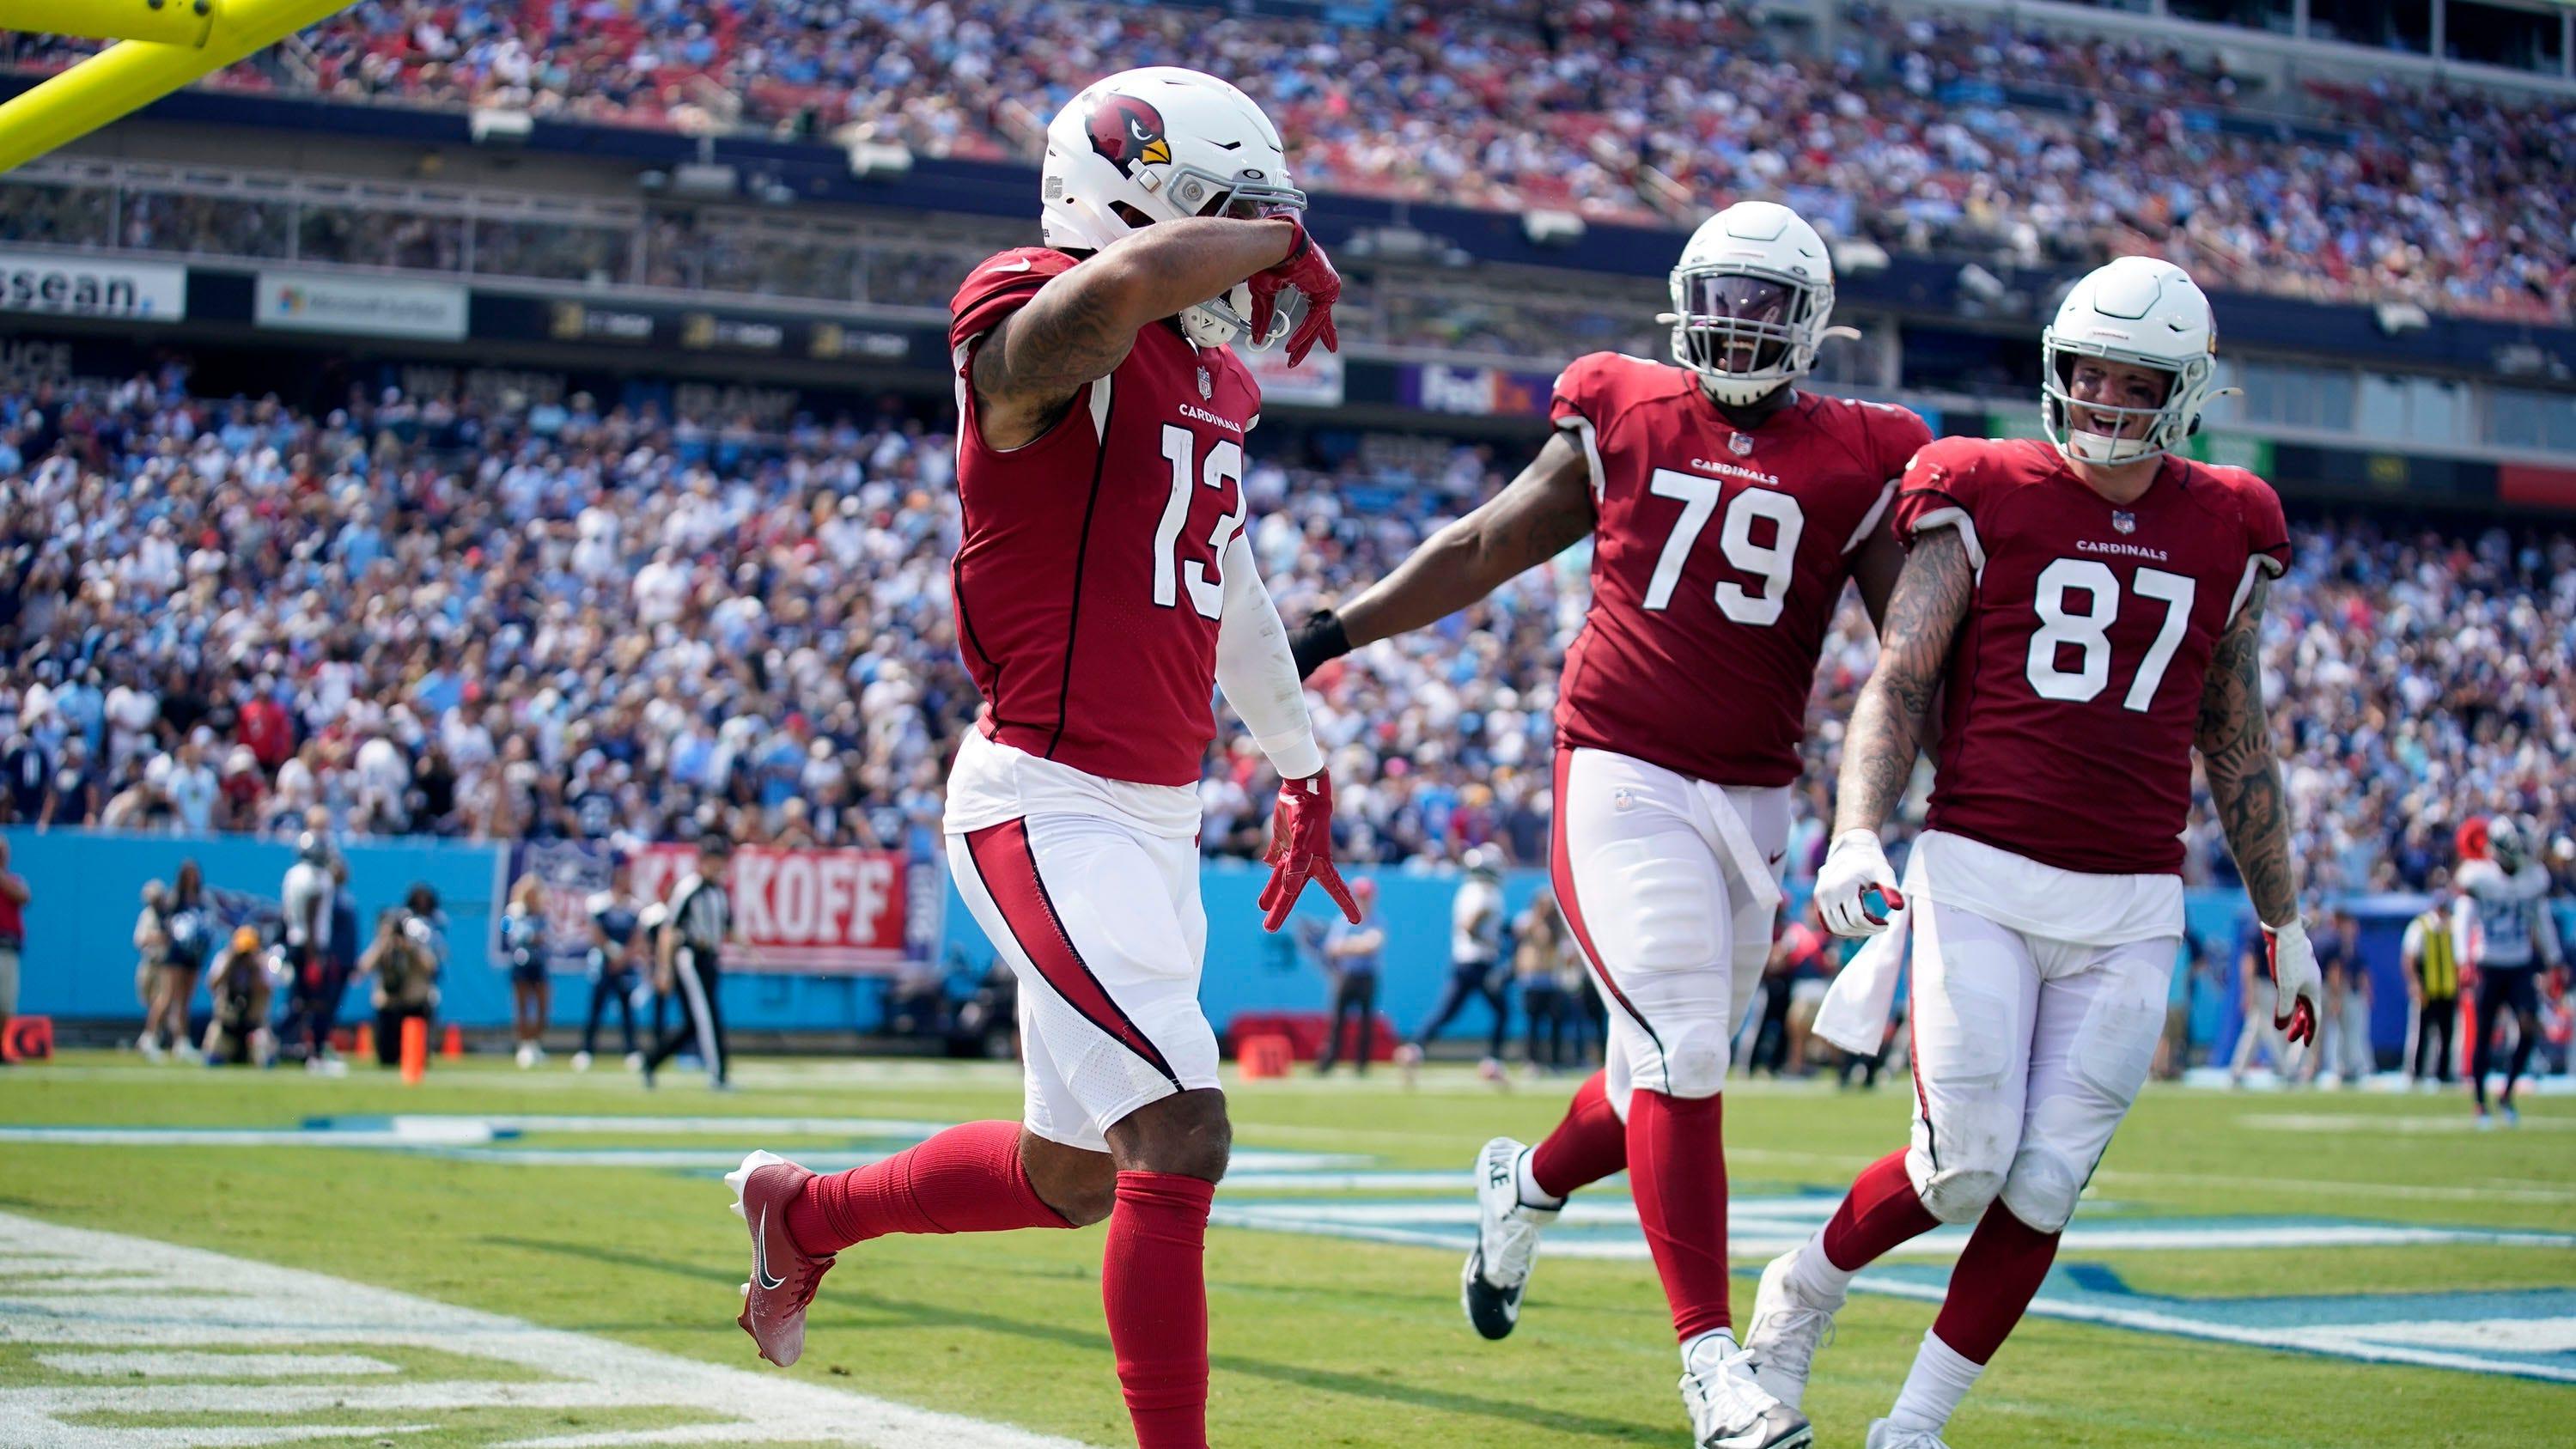 Arizona Cardinals wide receiver Christian Kirk (13) celebrates a touchdown during the third quarter at Nissan Stadium Sunday, Sept. 12, 2021 in Nashville, Tenn.  Titans Cards 168